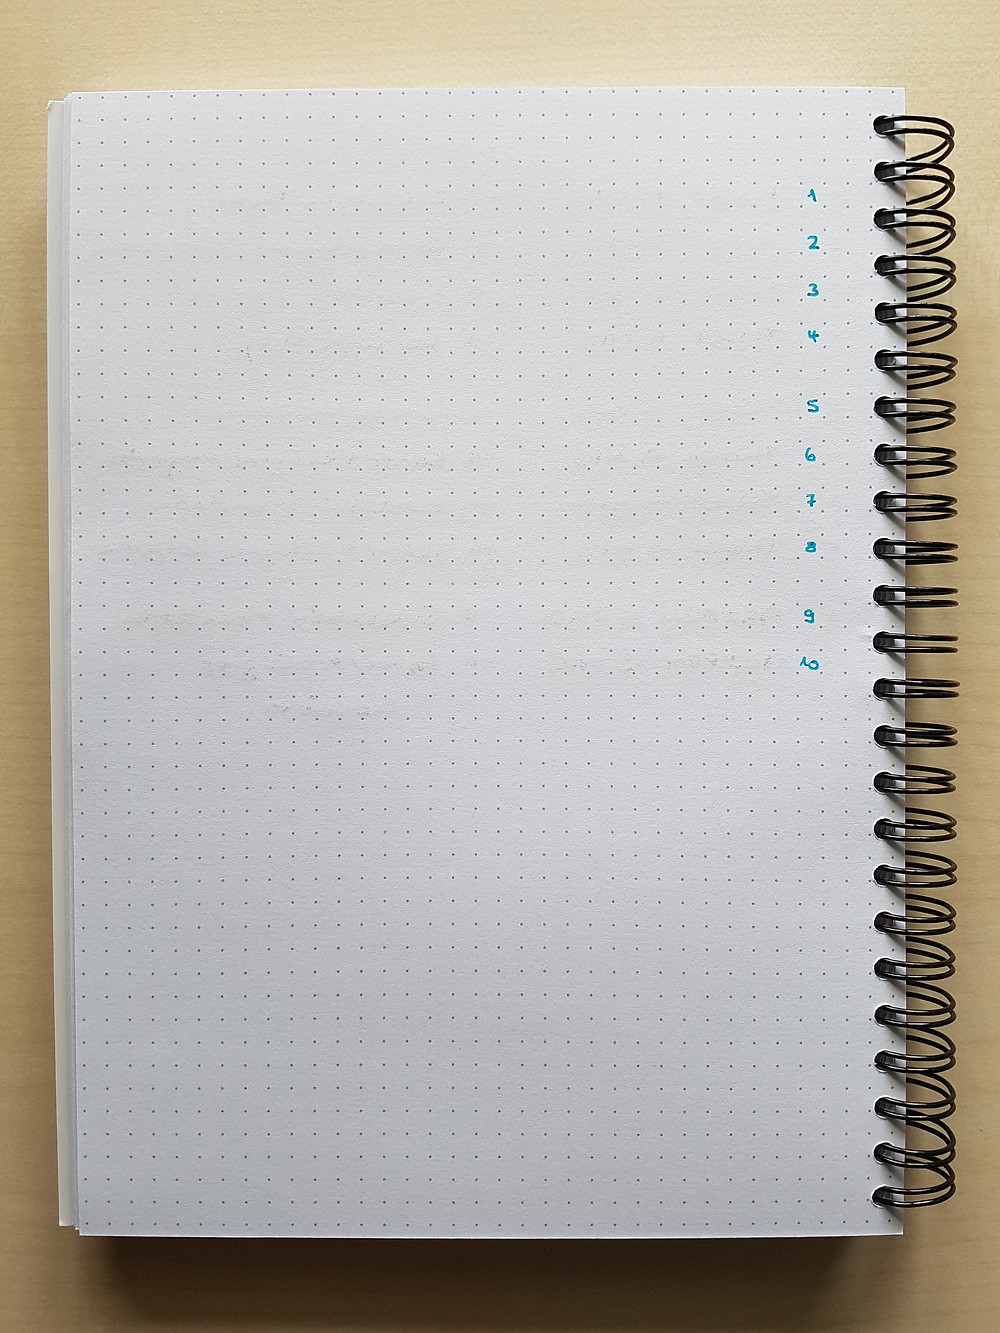 StickersSwissMade - blogpost - paper and pen test nbr 4 -  dotgrid.co notebooks_10